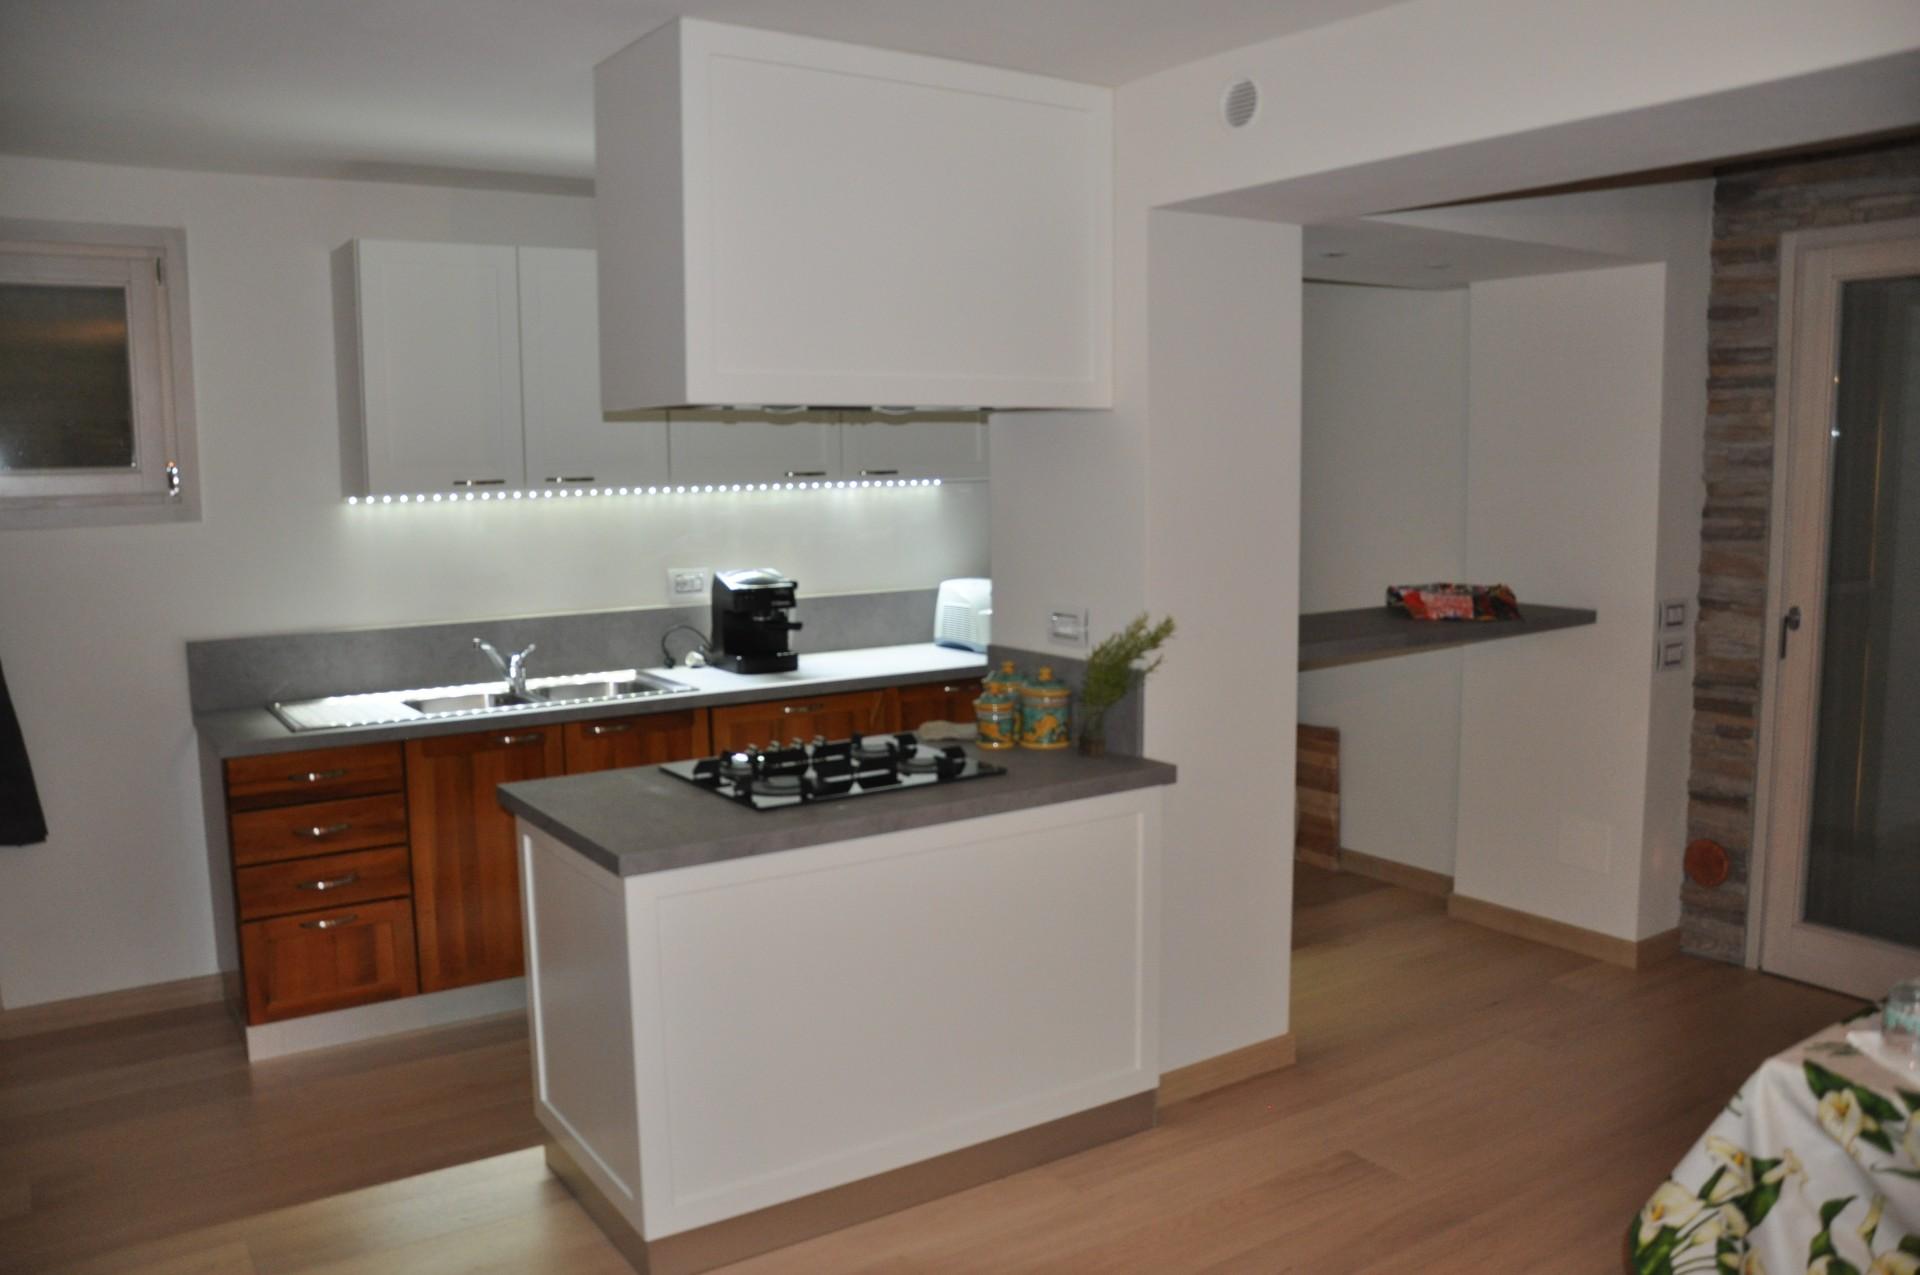 Cucine moderne fadini mobili cerea verona - Cucine con isola centrale moderne ...